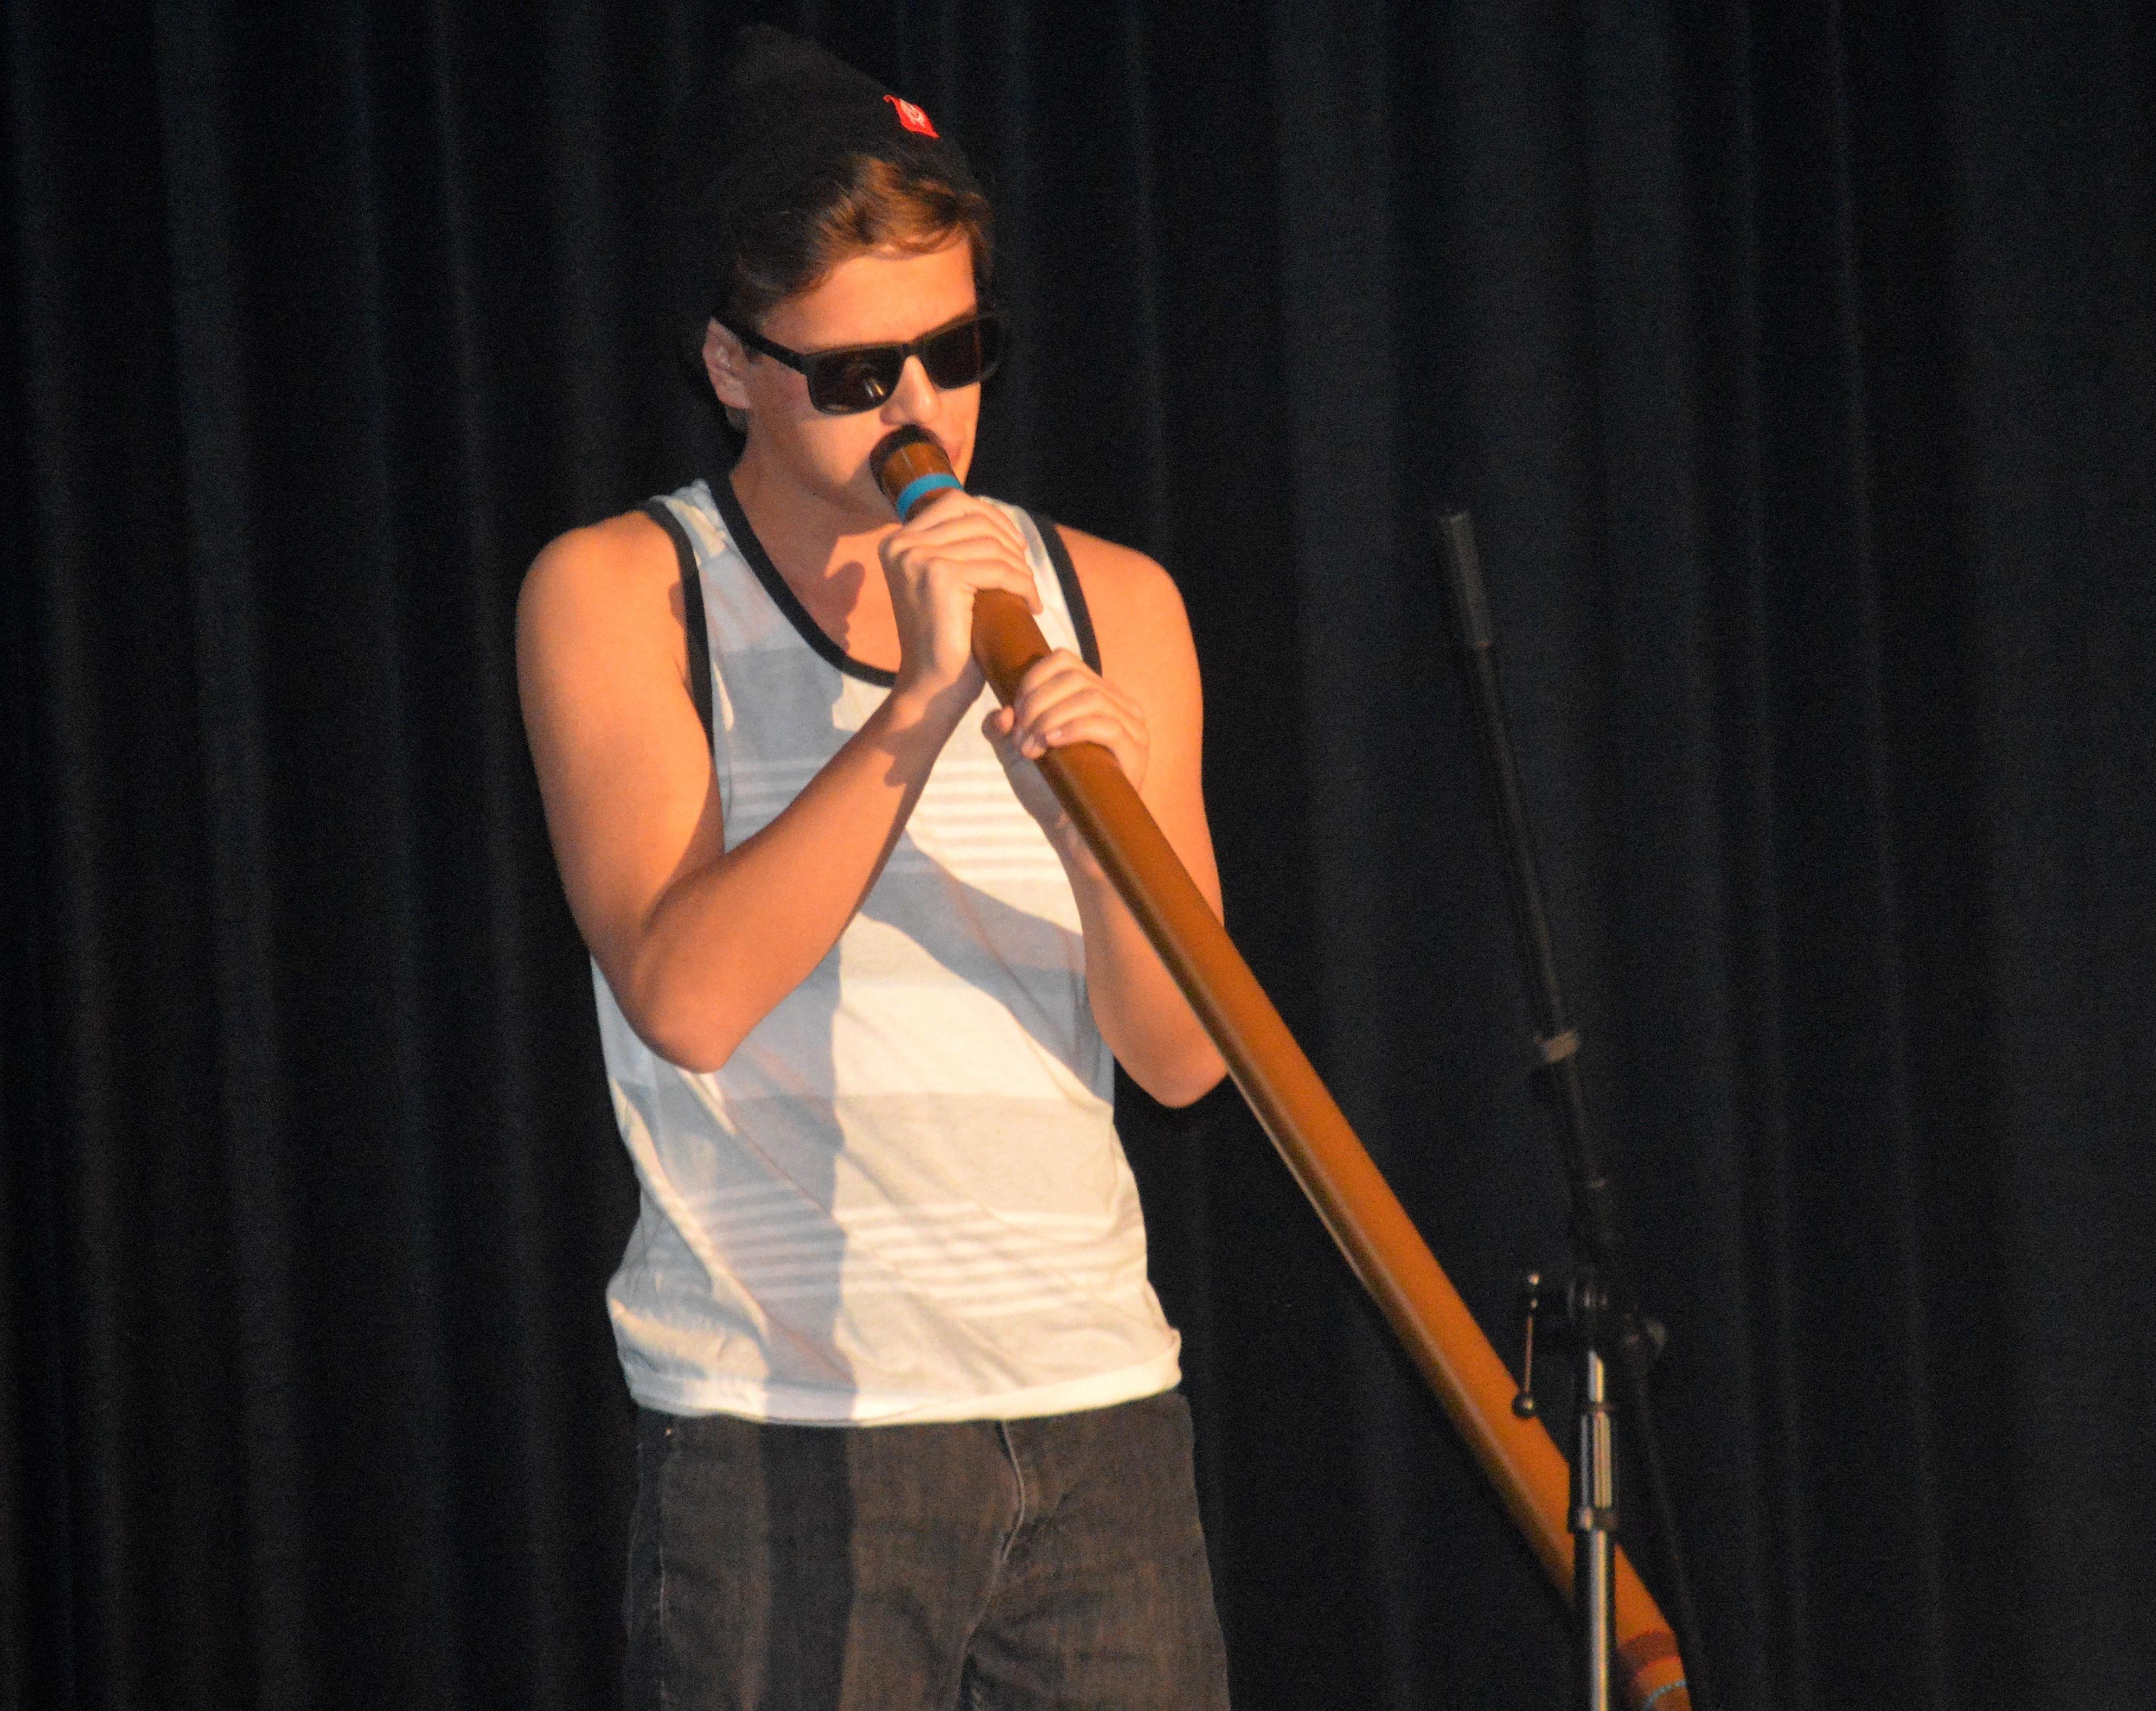 8f2c157015e5baac78e3_Dan_Dawson_on_the_didgerido.JPG